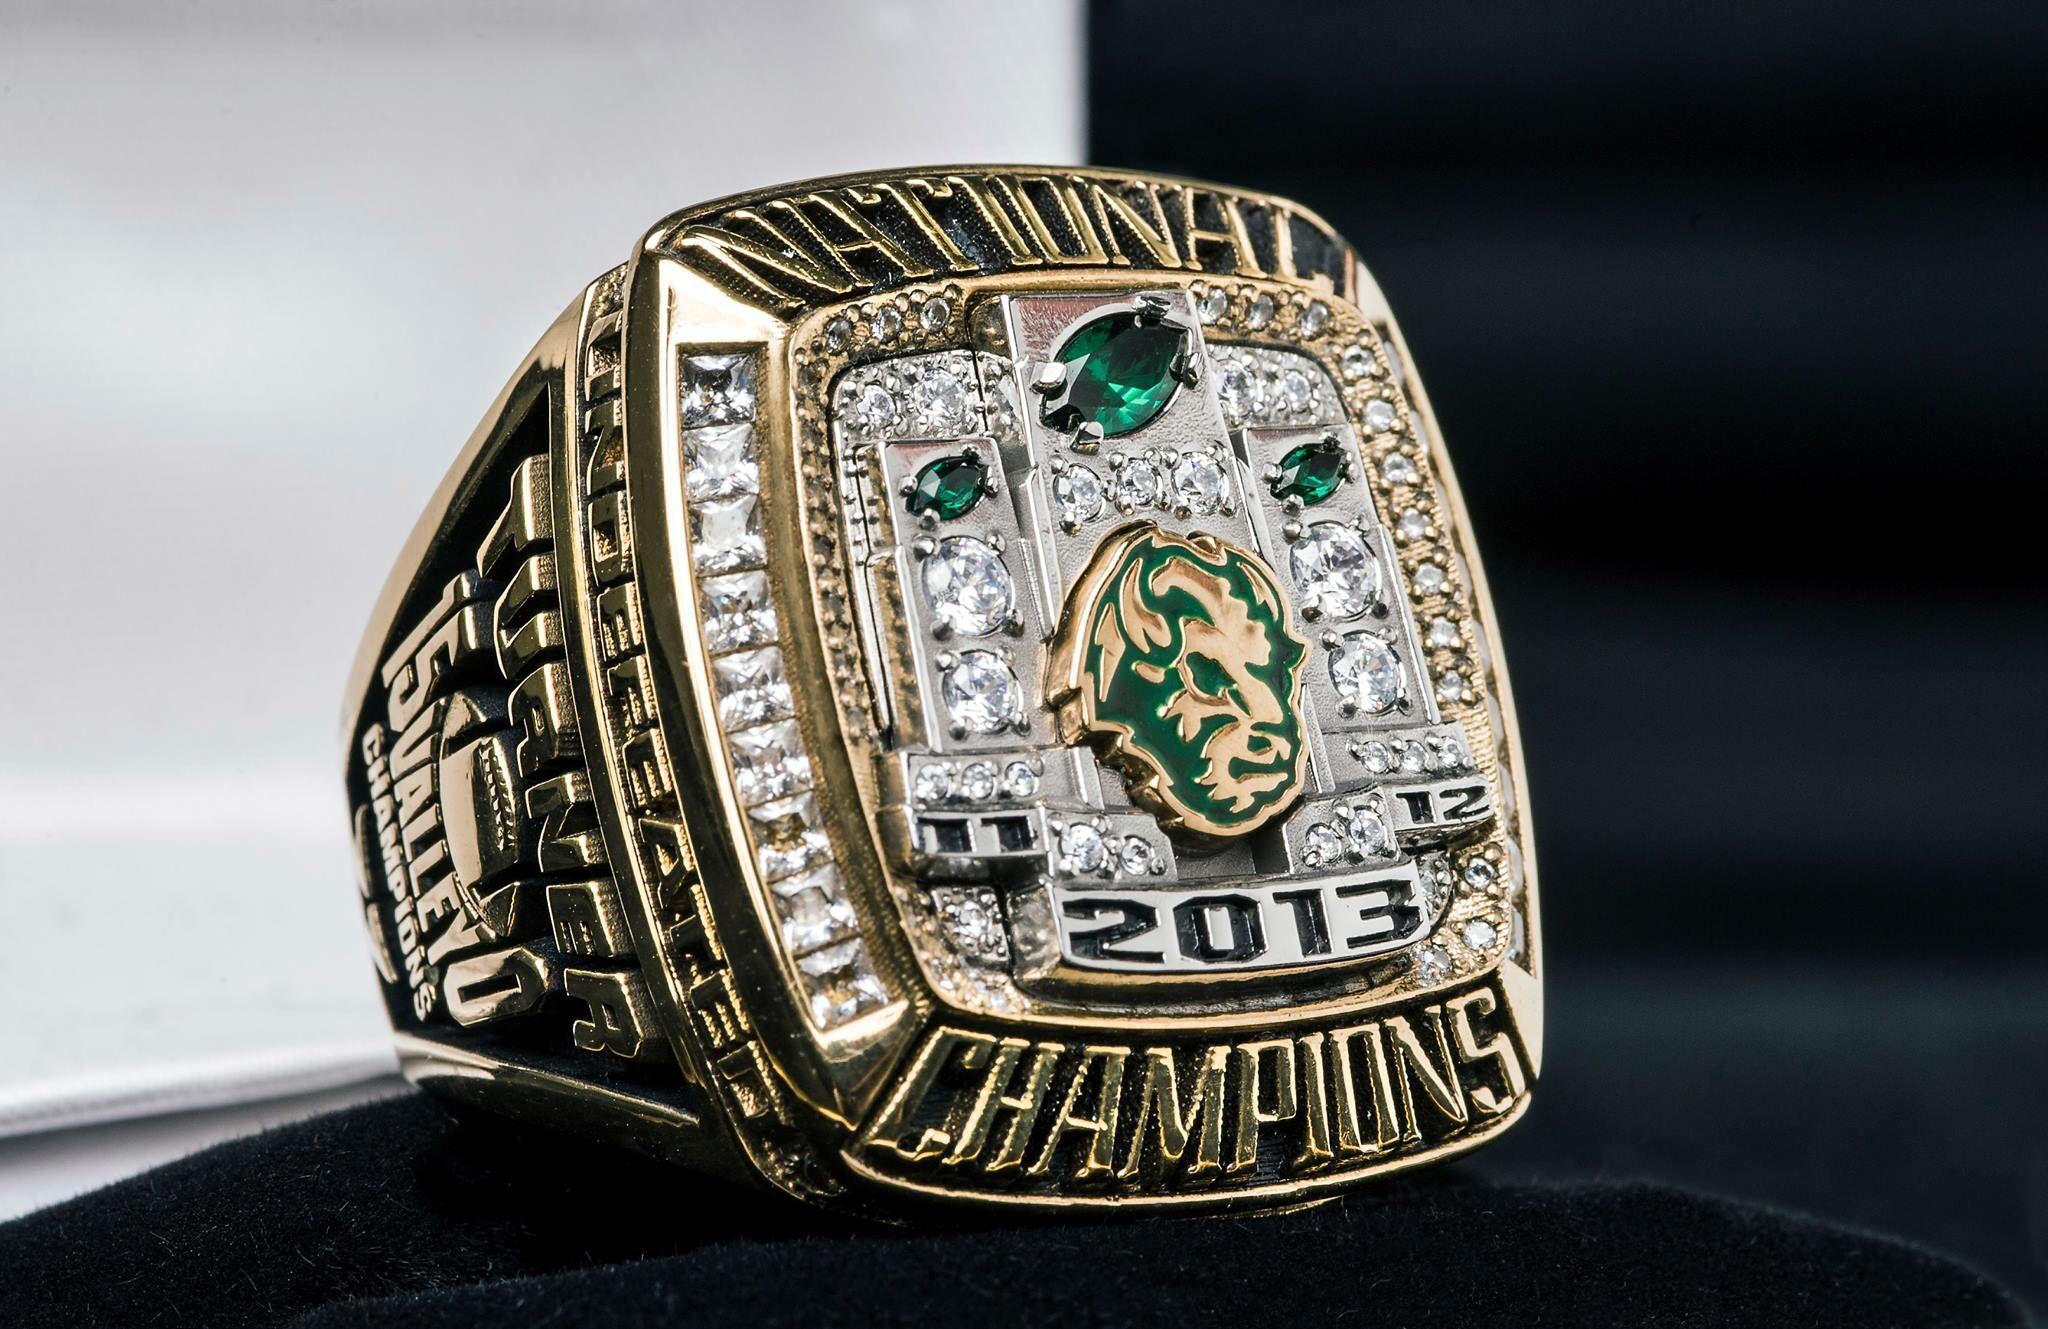 NDSU 2013 National Championship Ring! NDSU Bison